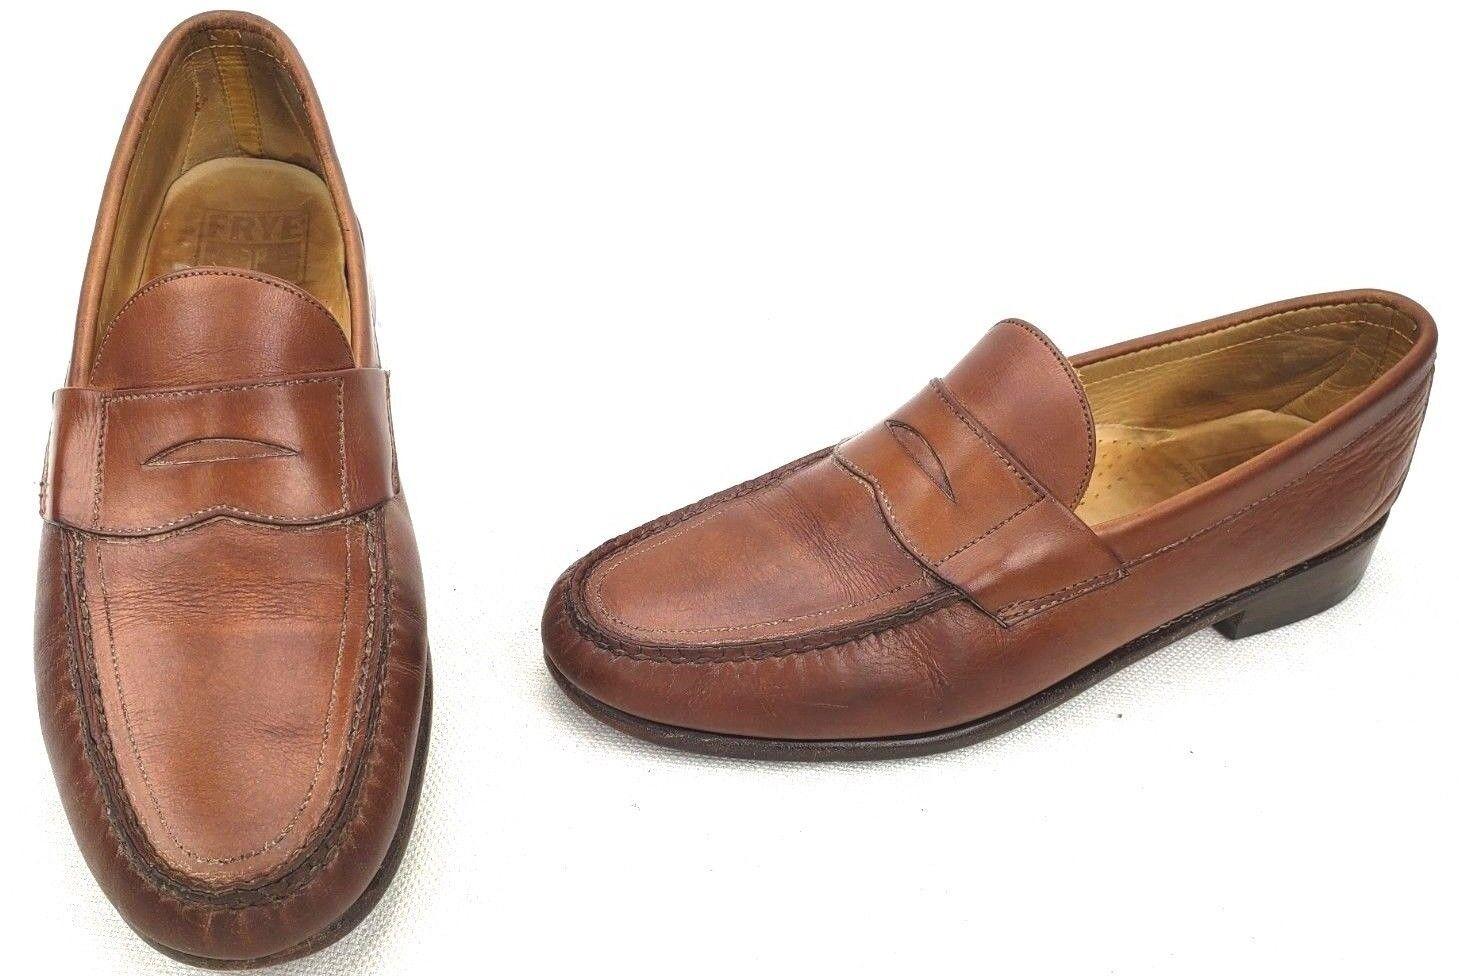 Frye Homme Penny Mocassins chaussures en cuir marron 10.5 m